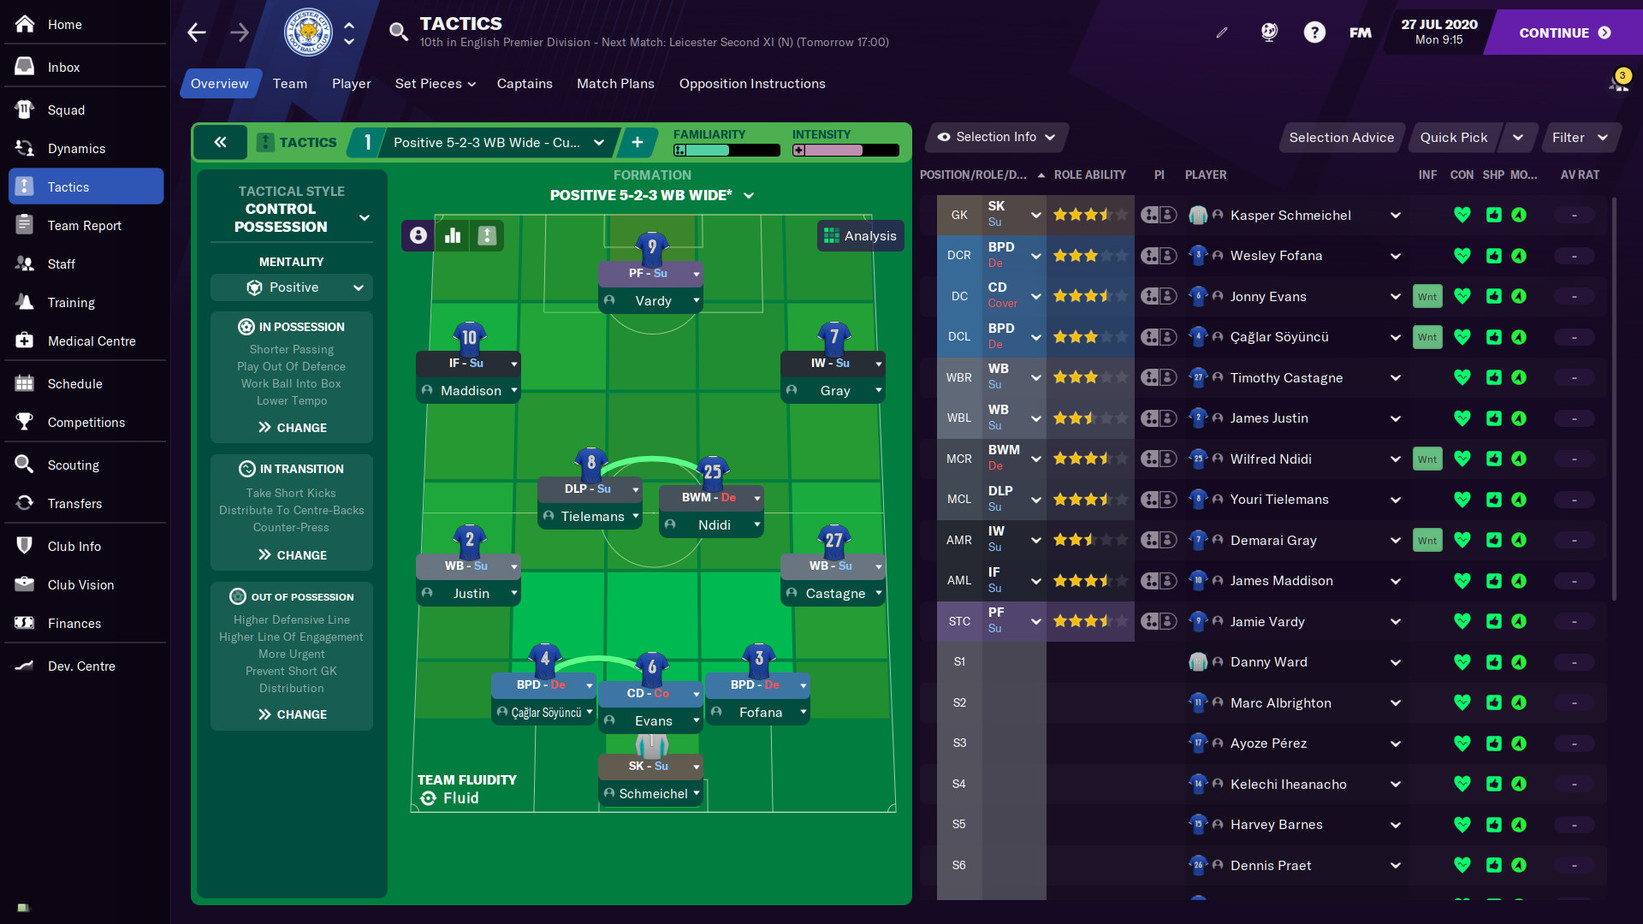 Football Manager 2021 macOS